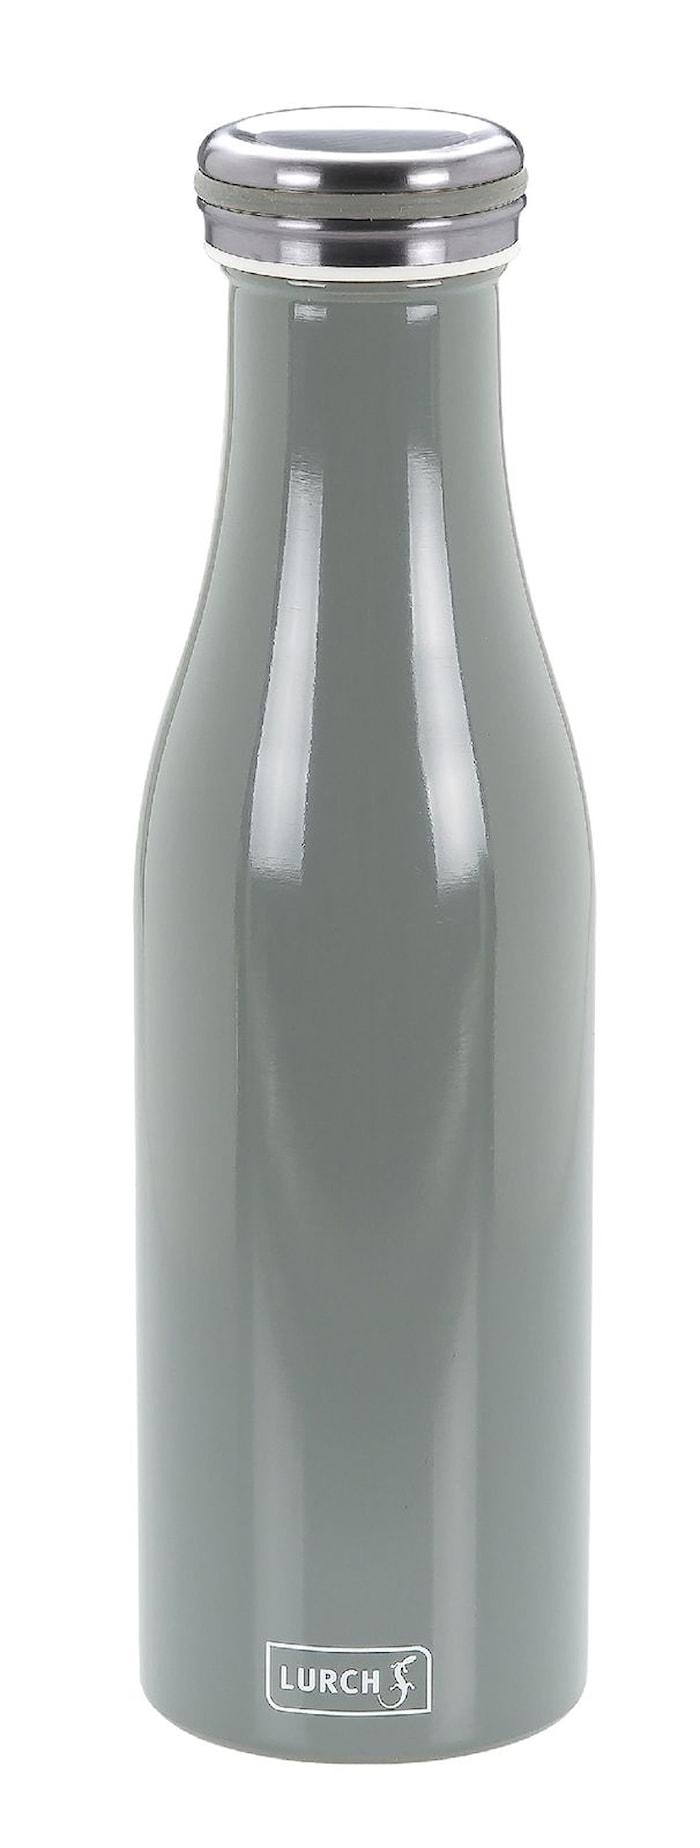 Termoflaske, Rustfri stål, 0,5L, Grå